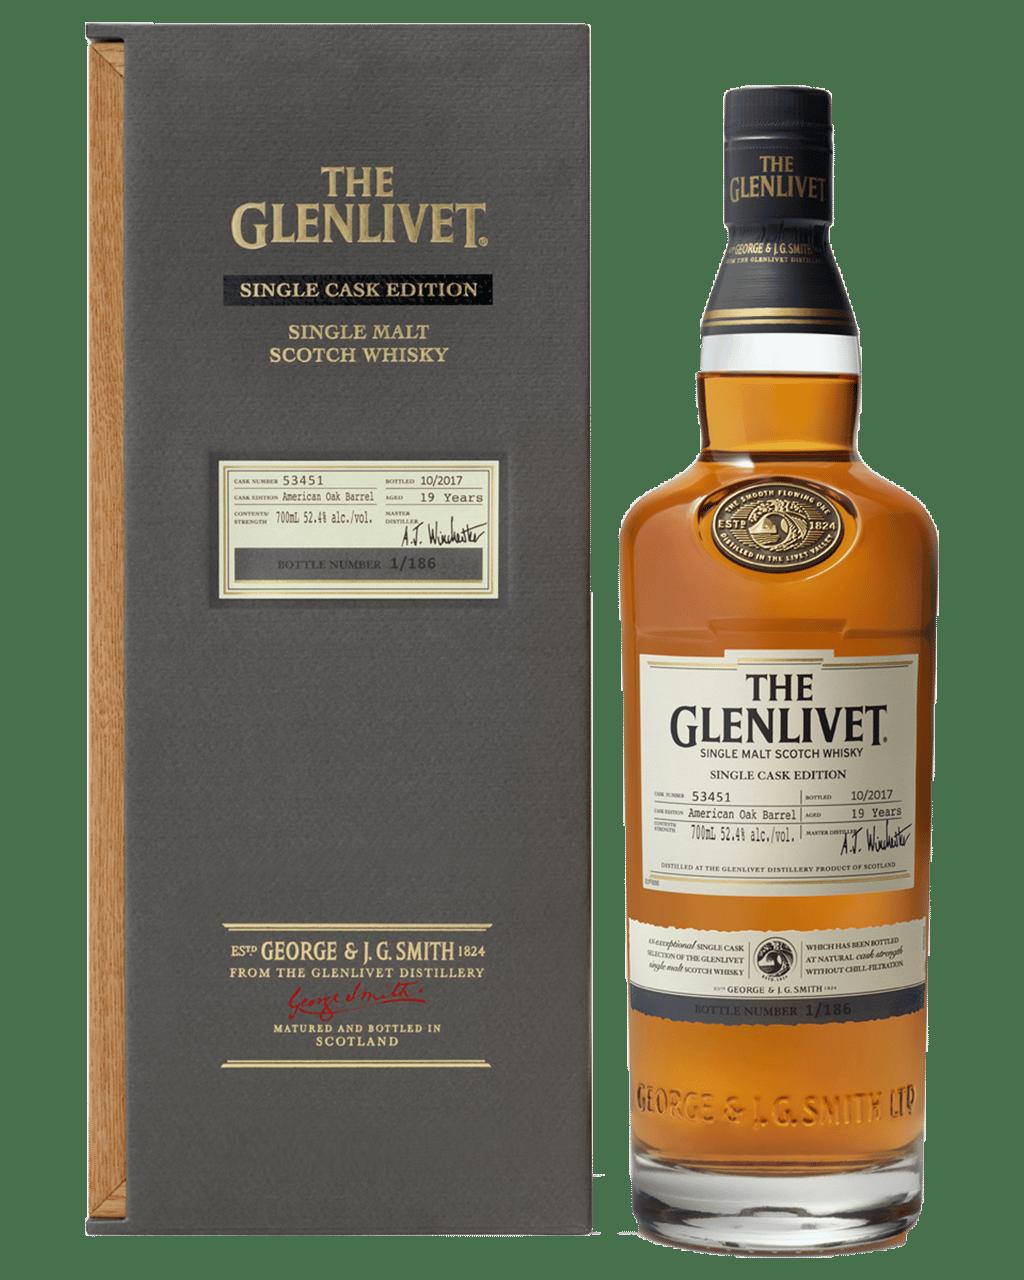 2bc07306346 The Glenlivet 19 Year Old Single Cask Scotch Whisky 700mL